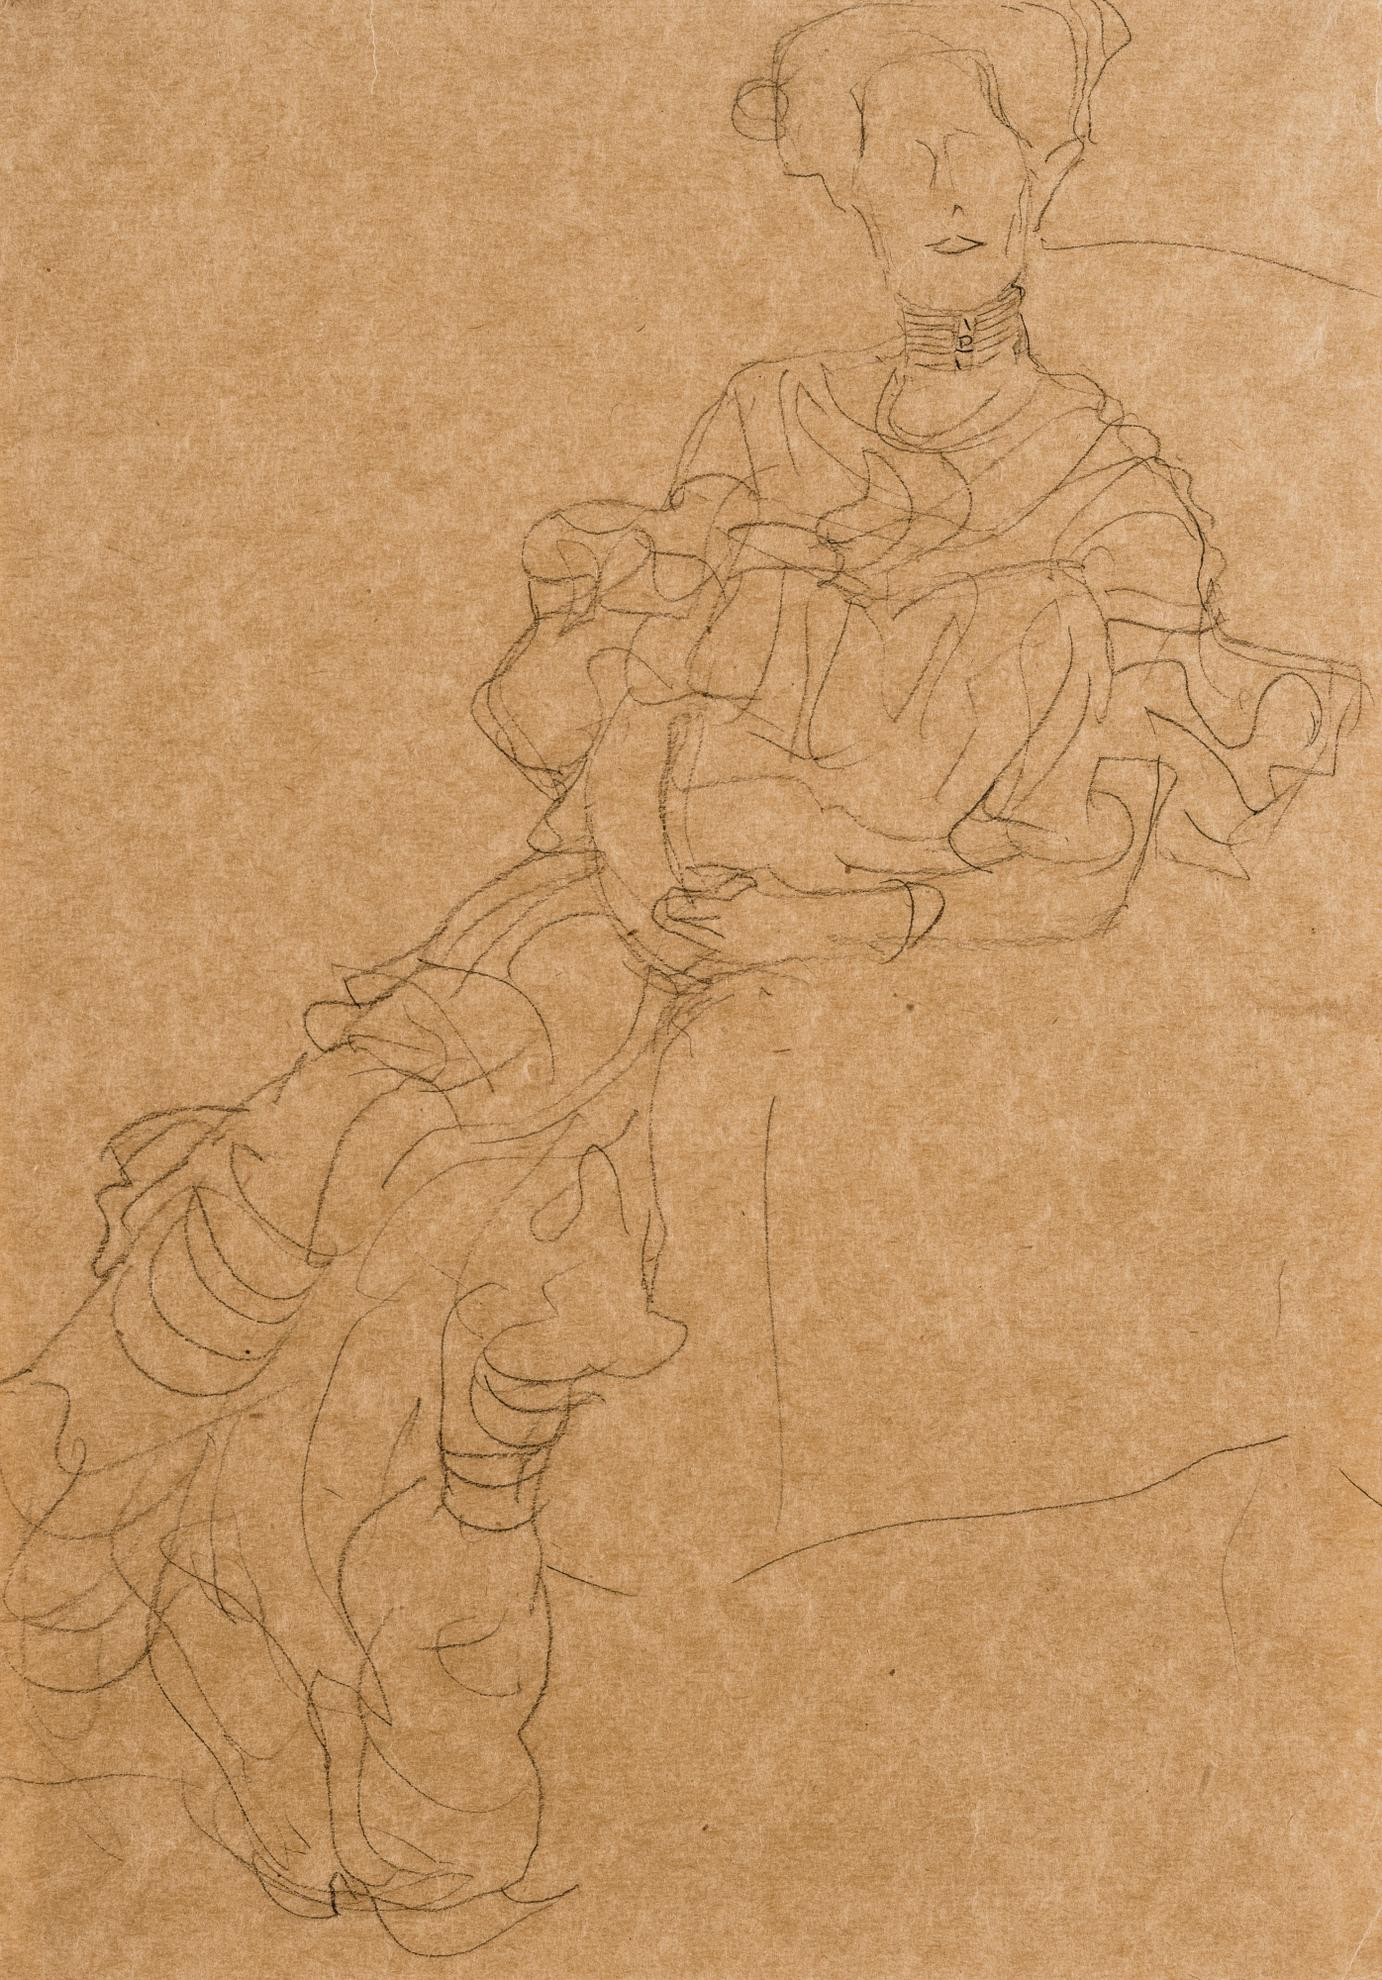 Gustav Klimt-Fritza Riedler Im Ruschenkleid (Fritza Riedler In A Frilled Dress)-1905